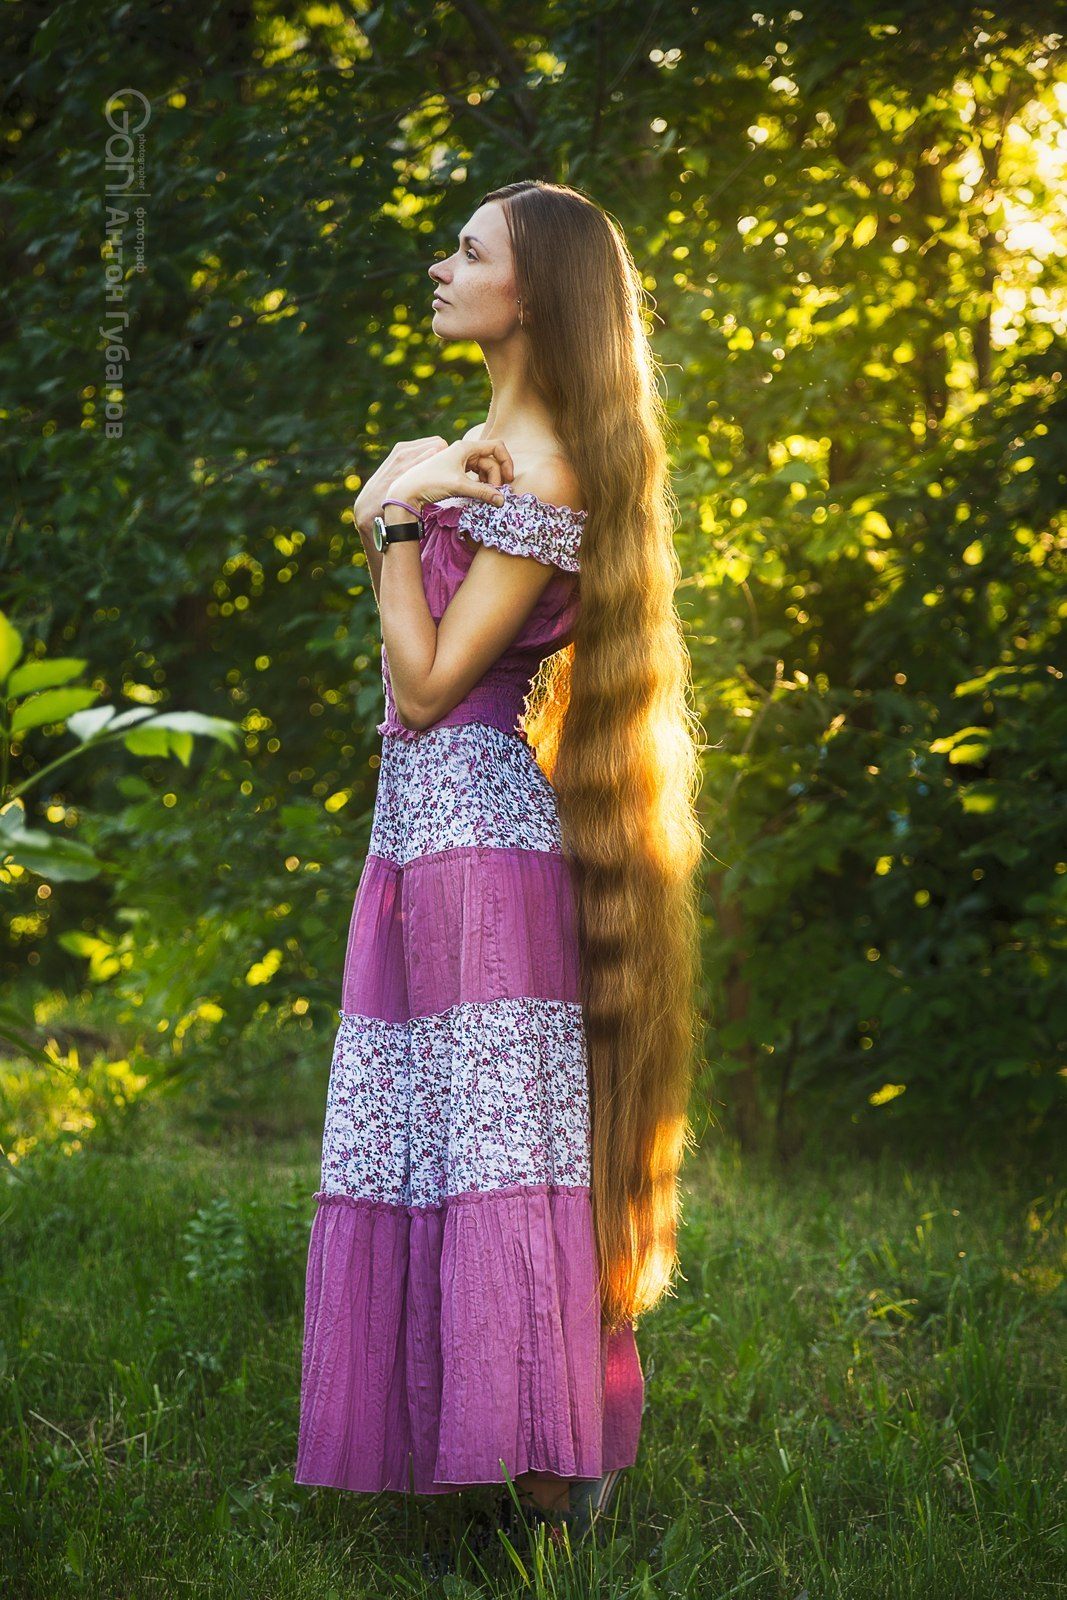 Ha Hair Accessories For Apostolic Long Hair - Beautiful long shiny hair u vi a s